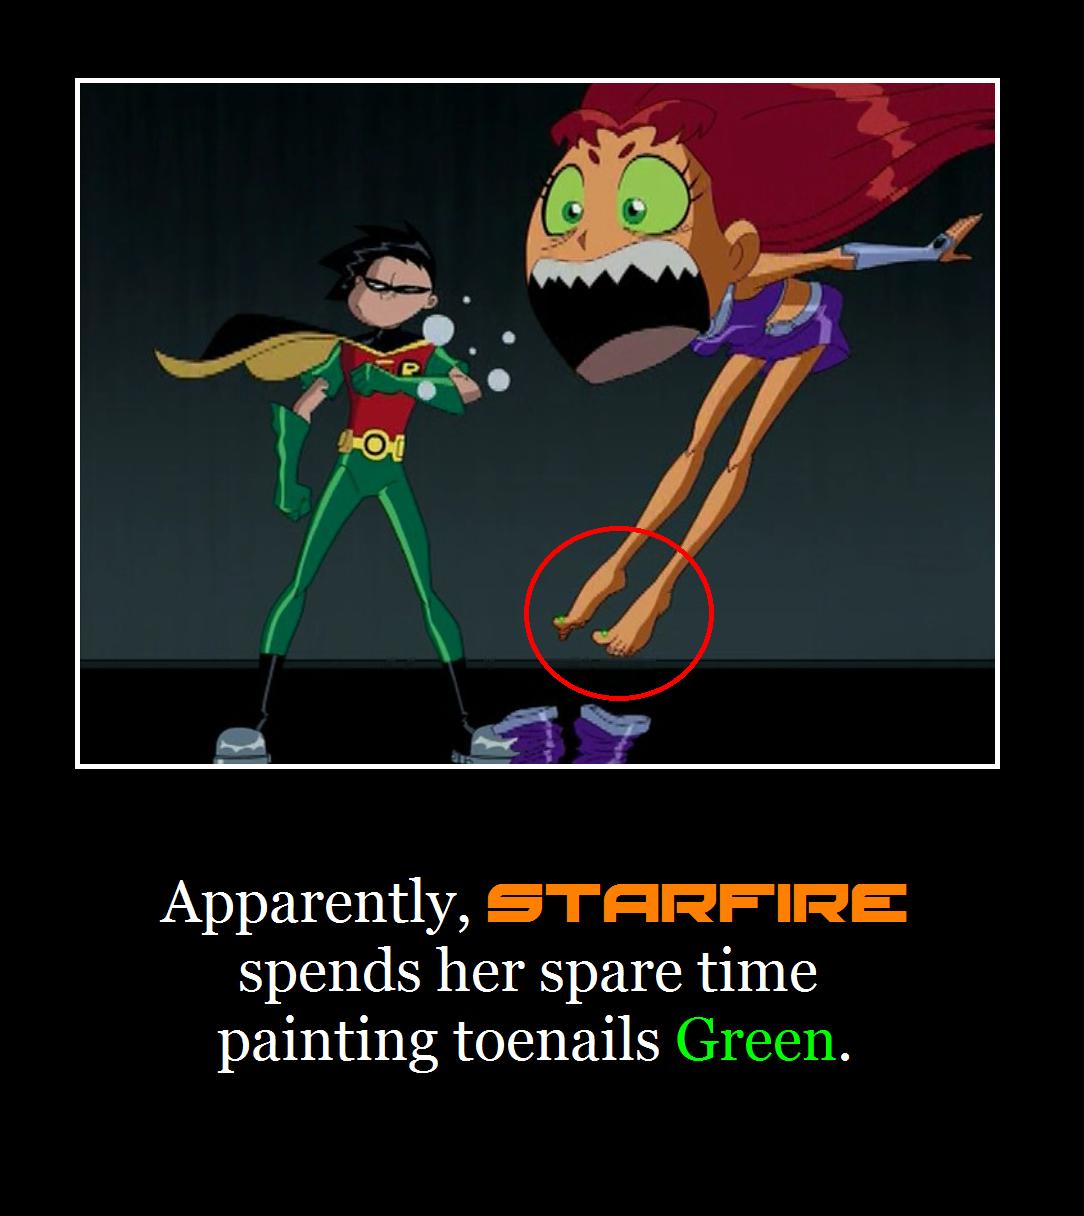 Starfire Humor Motivational by MetroXLR99 on DeviantArt